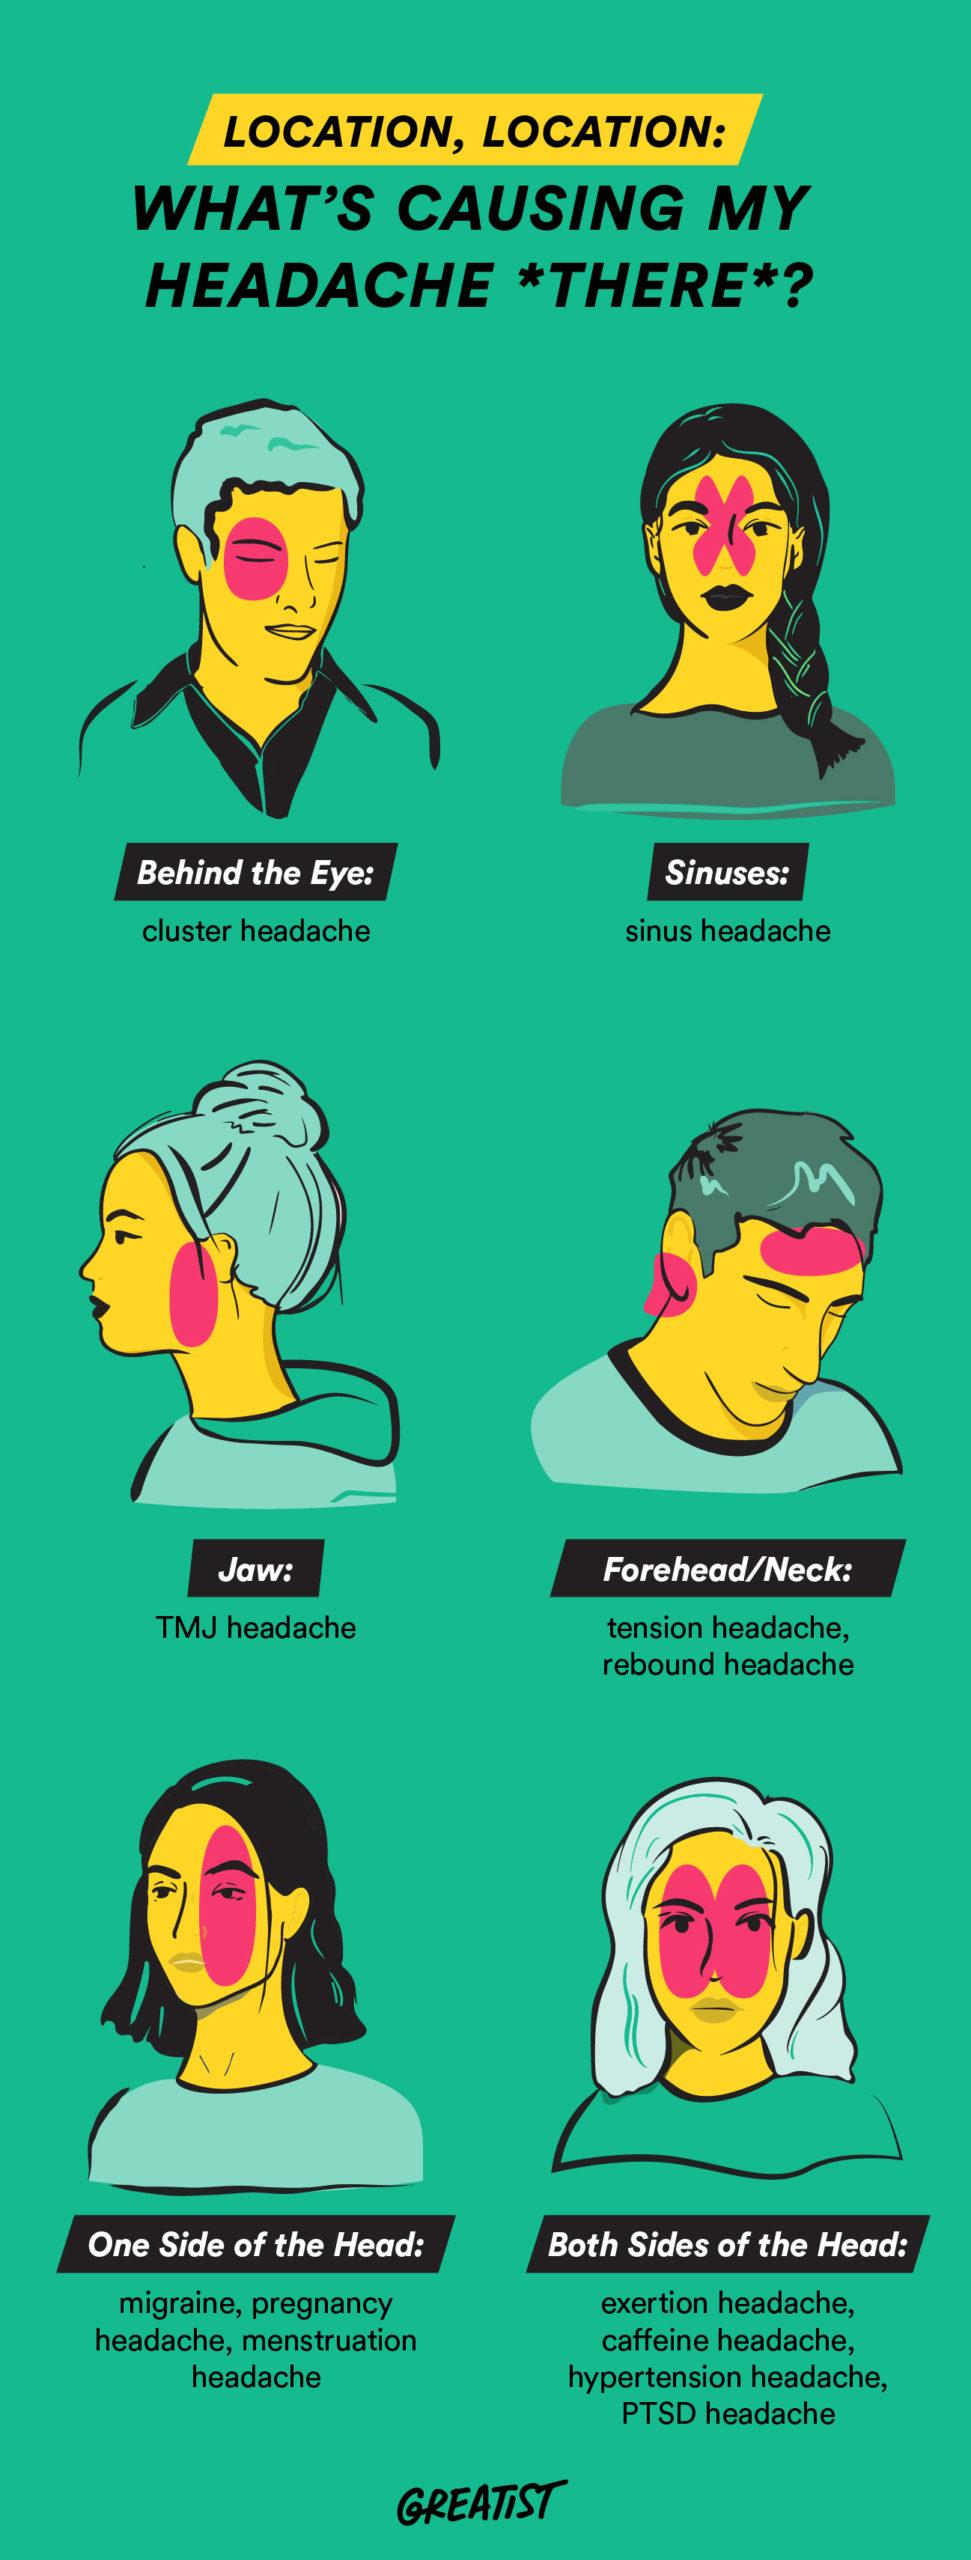 Location, Location: What's Causing My Headache *There*? #infographic #Headache #infographics #Infographic #Headache location #Headache treatment